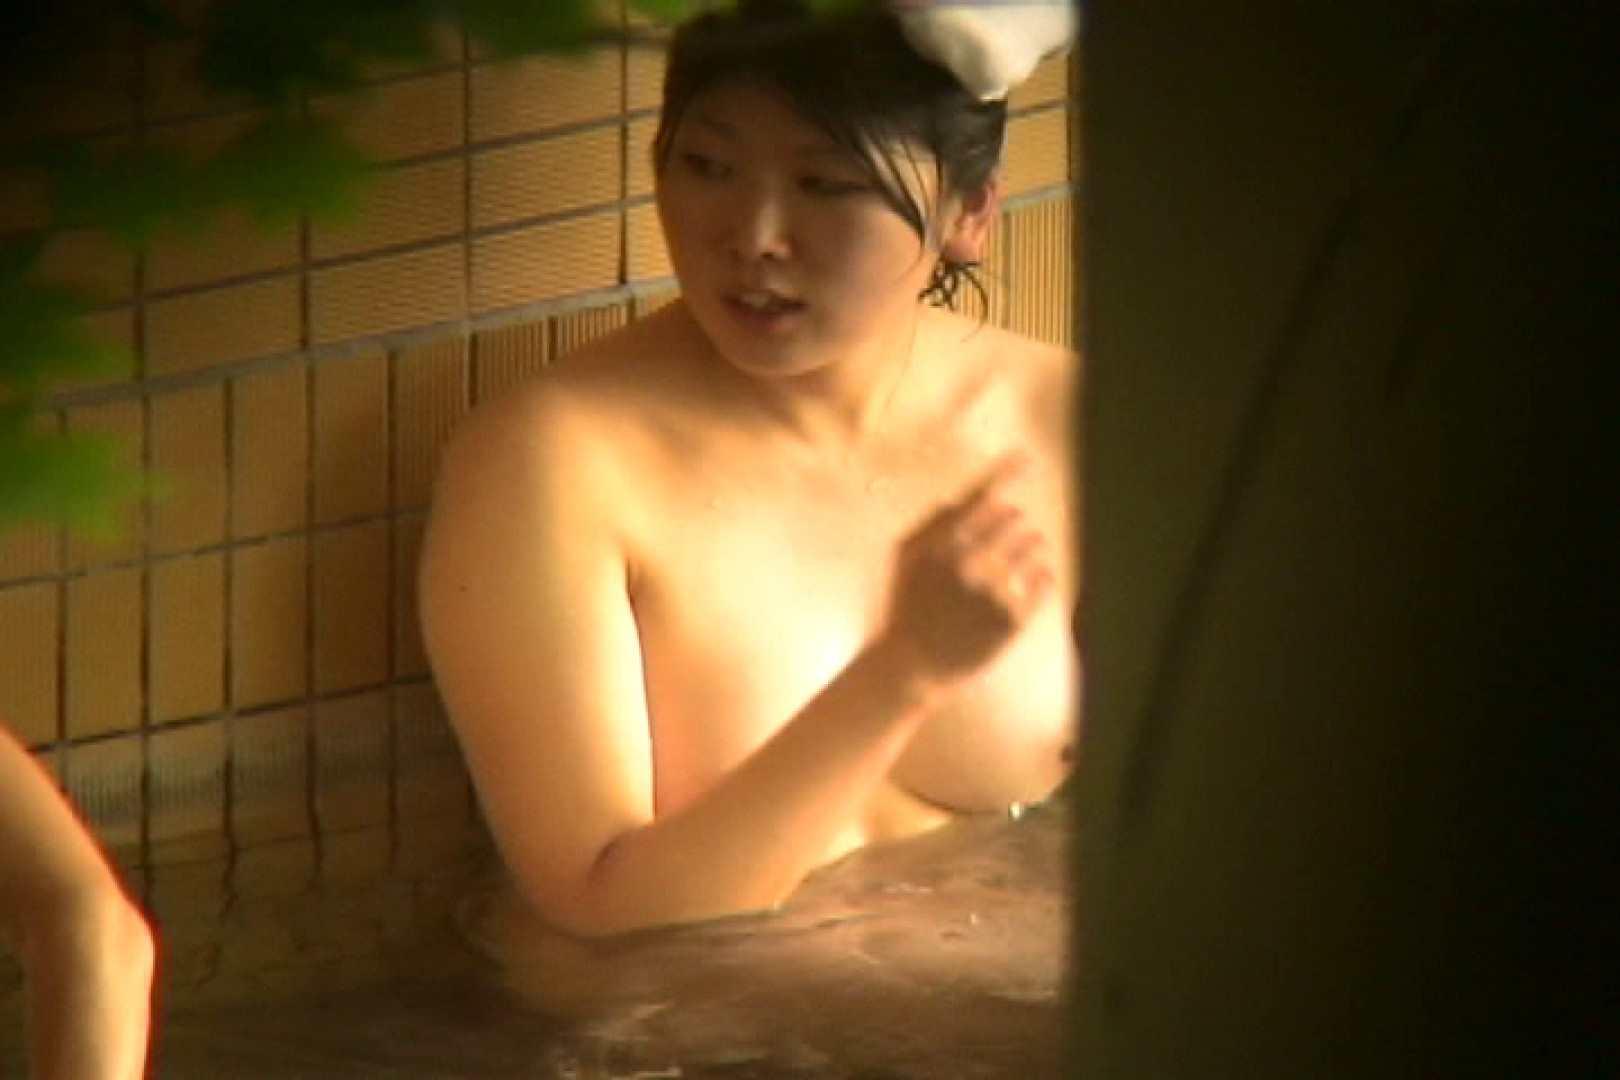 Aquaな露天風呂Vol.704 OLのエロ生活 | 露天風呂  38連発 25